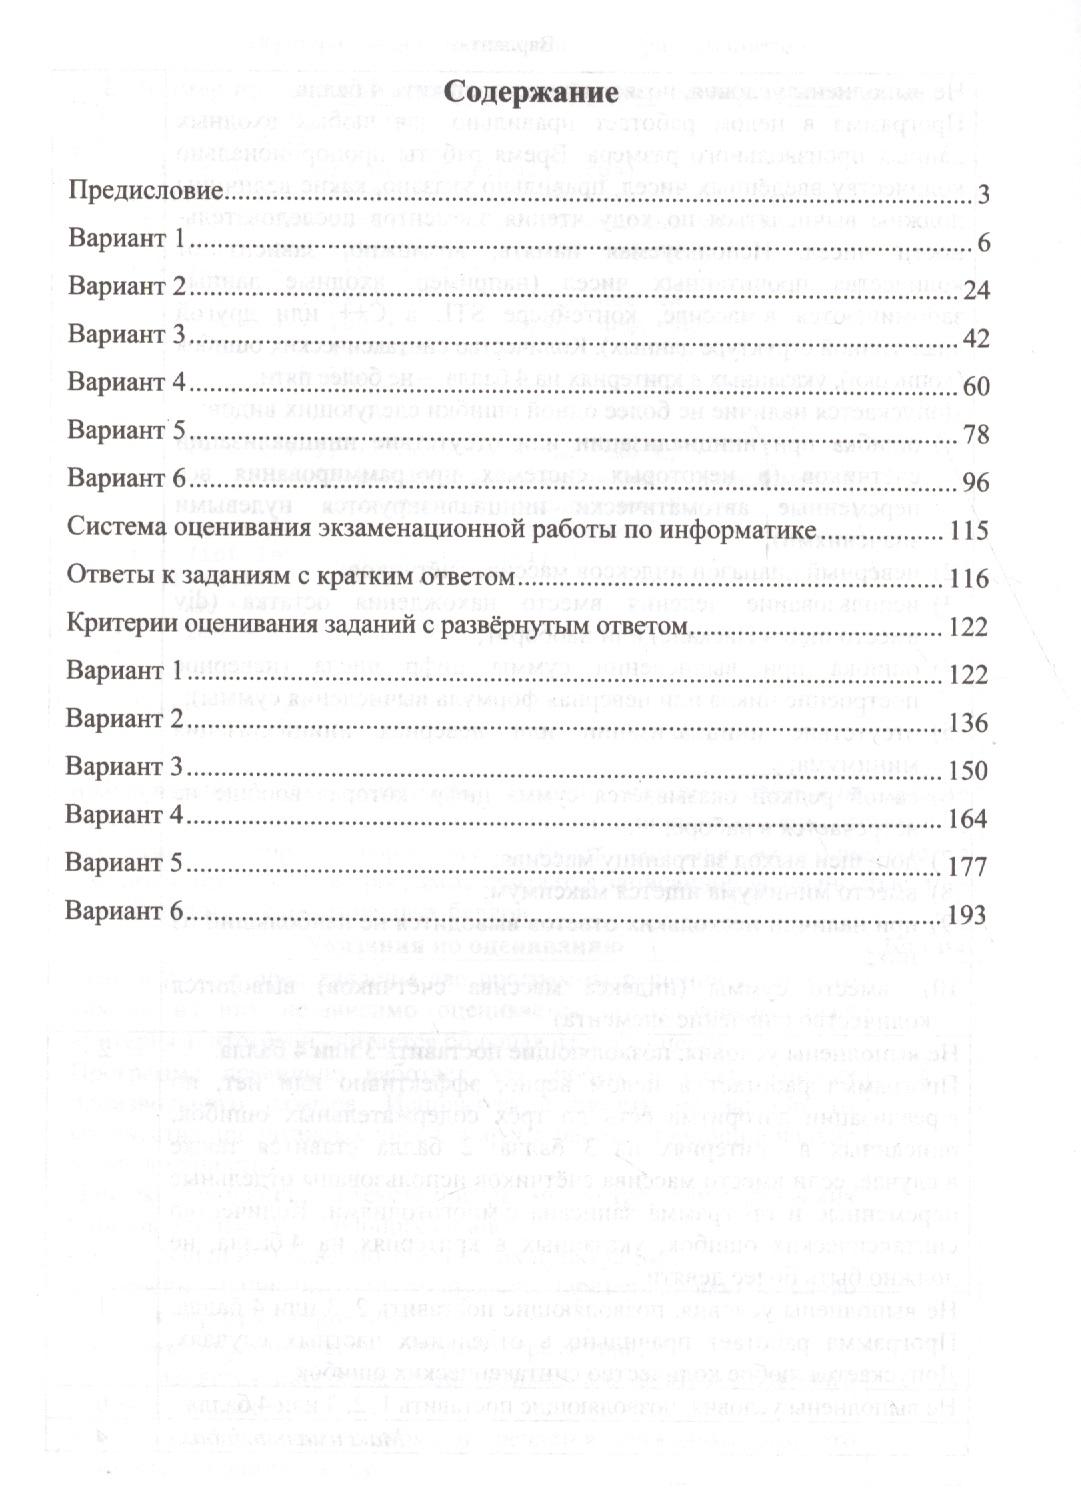 Статград 2018-2018 математика 11 класс задания